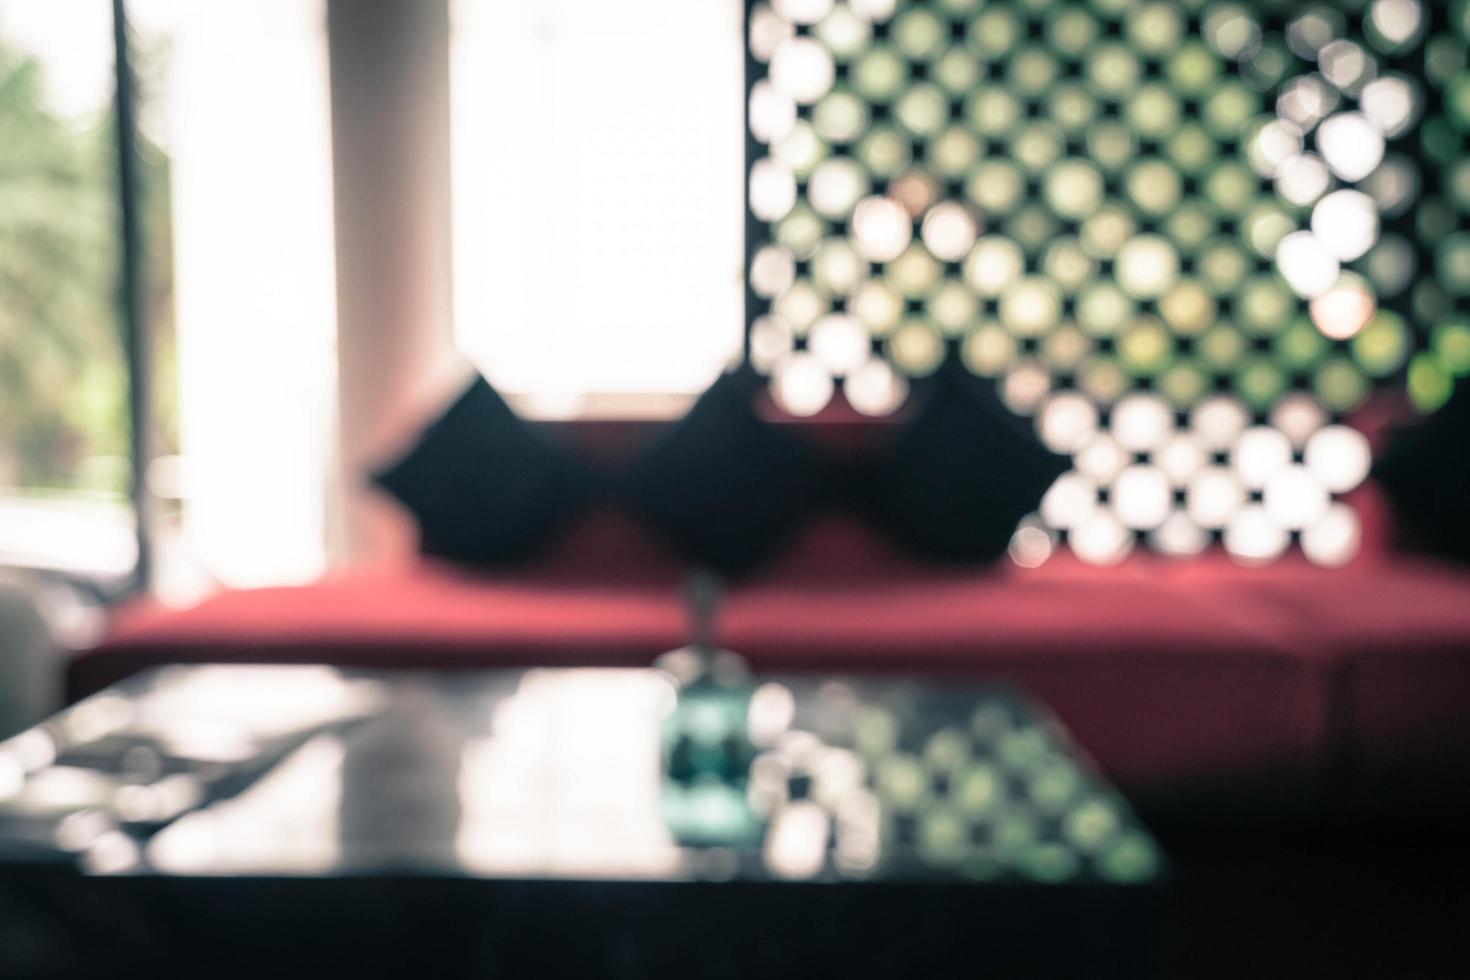 abstract vervagen interieur in hotel - vintage effectfilter foto